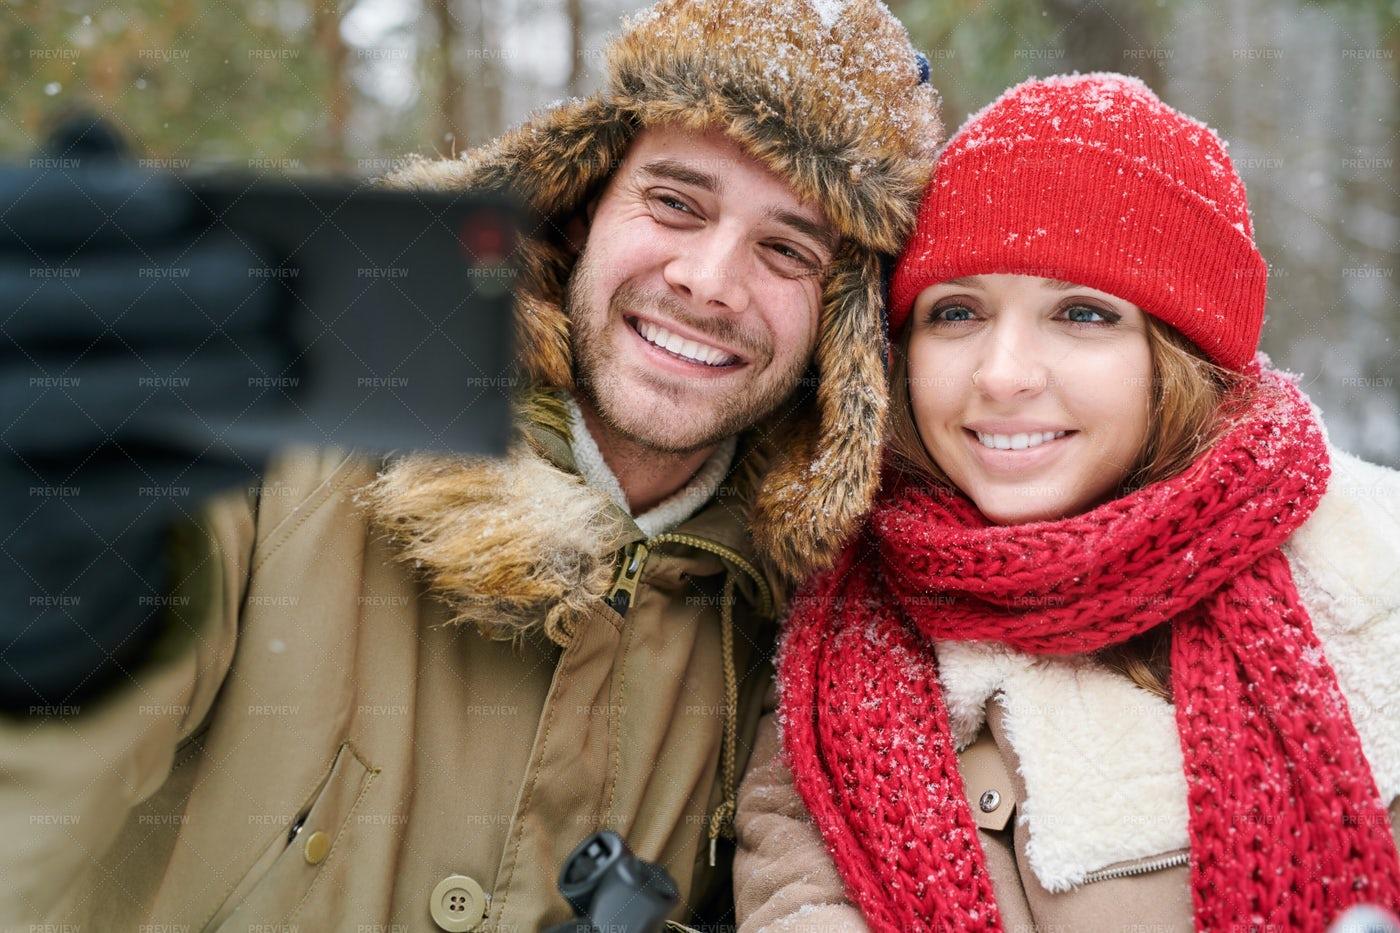 Couple Taking Selfie In Winter: Stock Photos